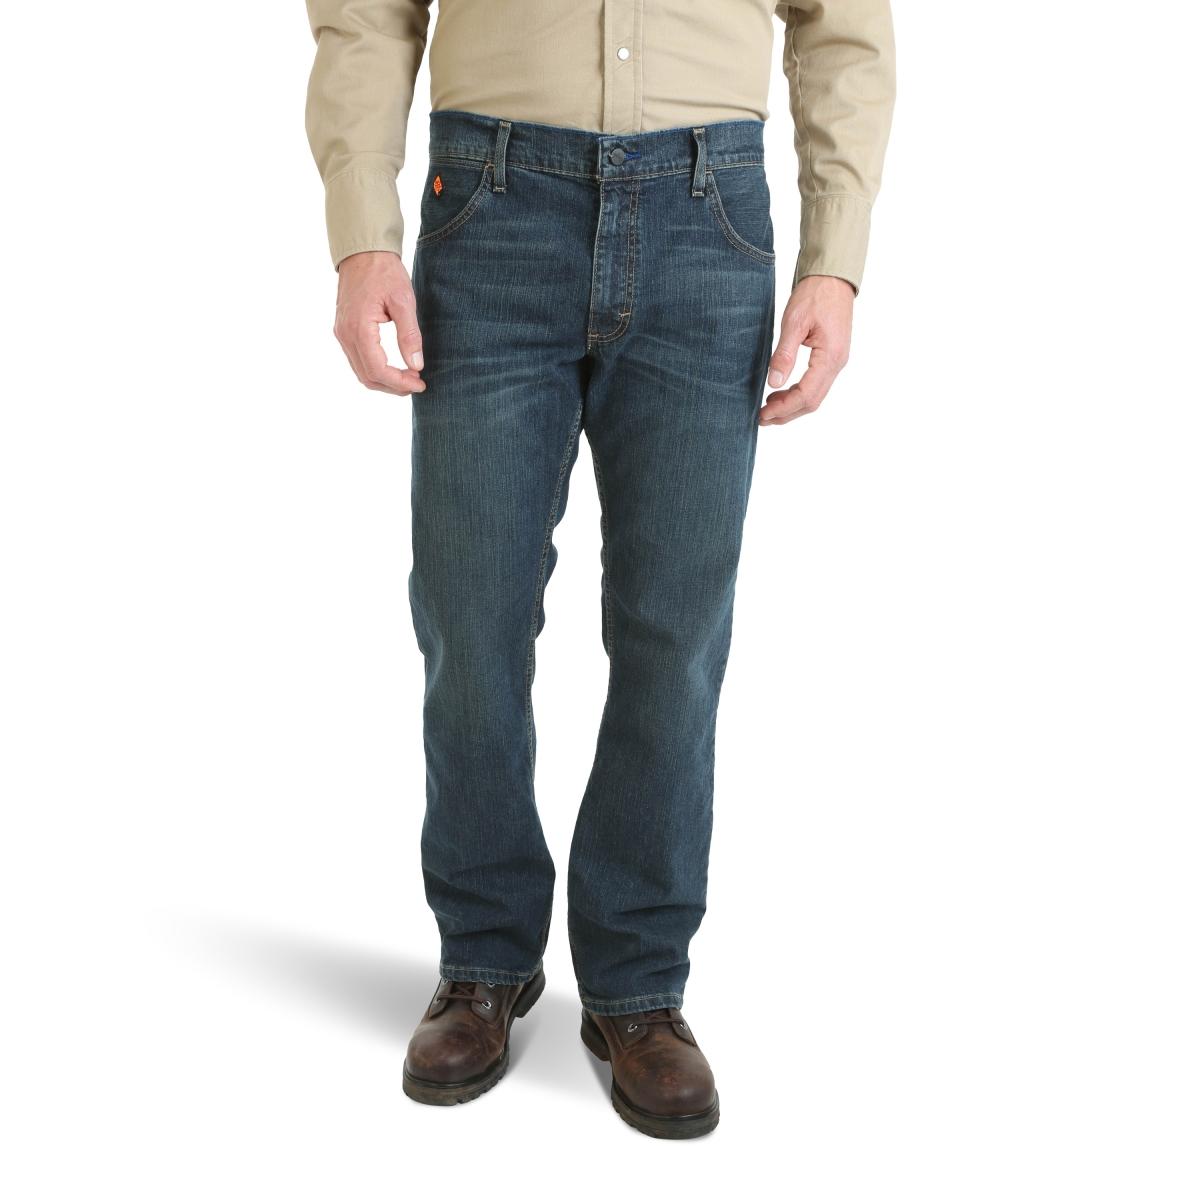 Wrangler® FR Flame Resistant Advanced Comfort Caden Slim Boot Jean